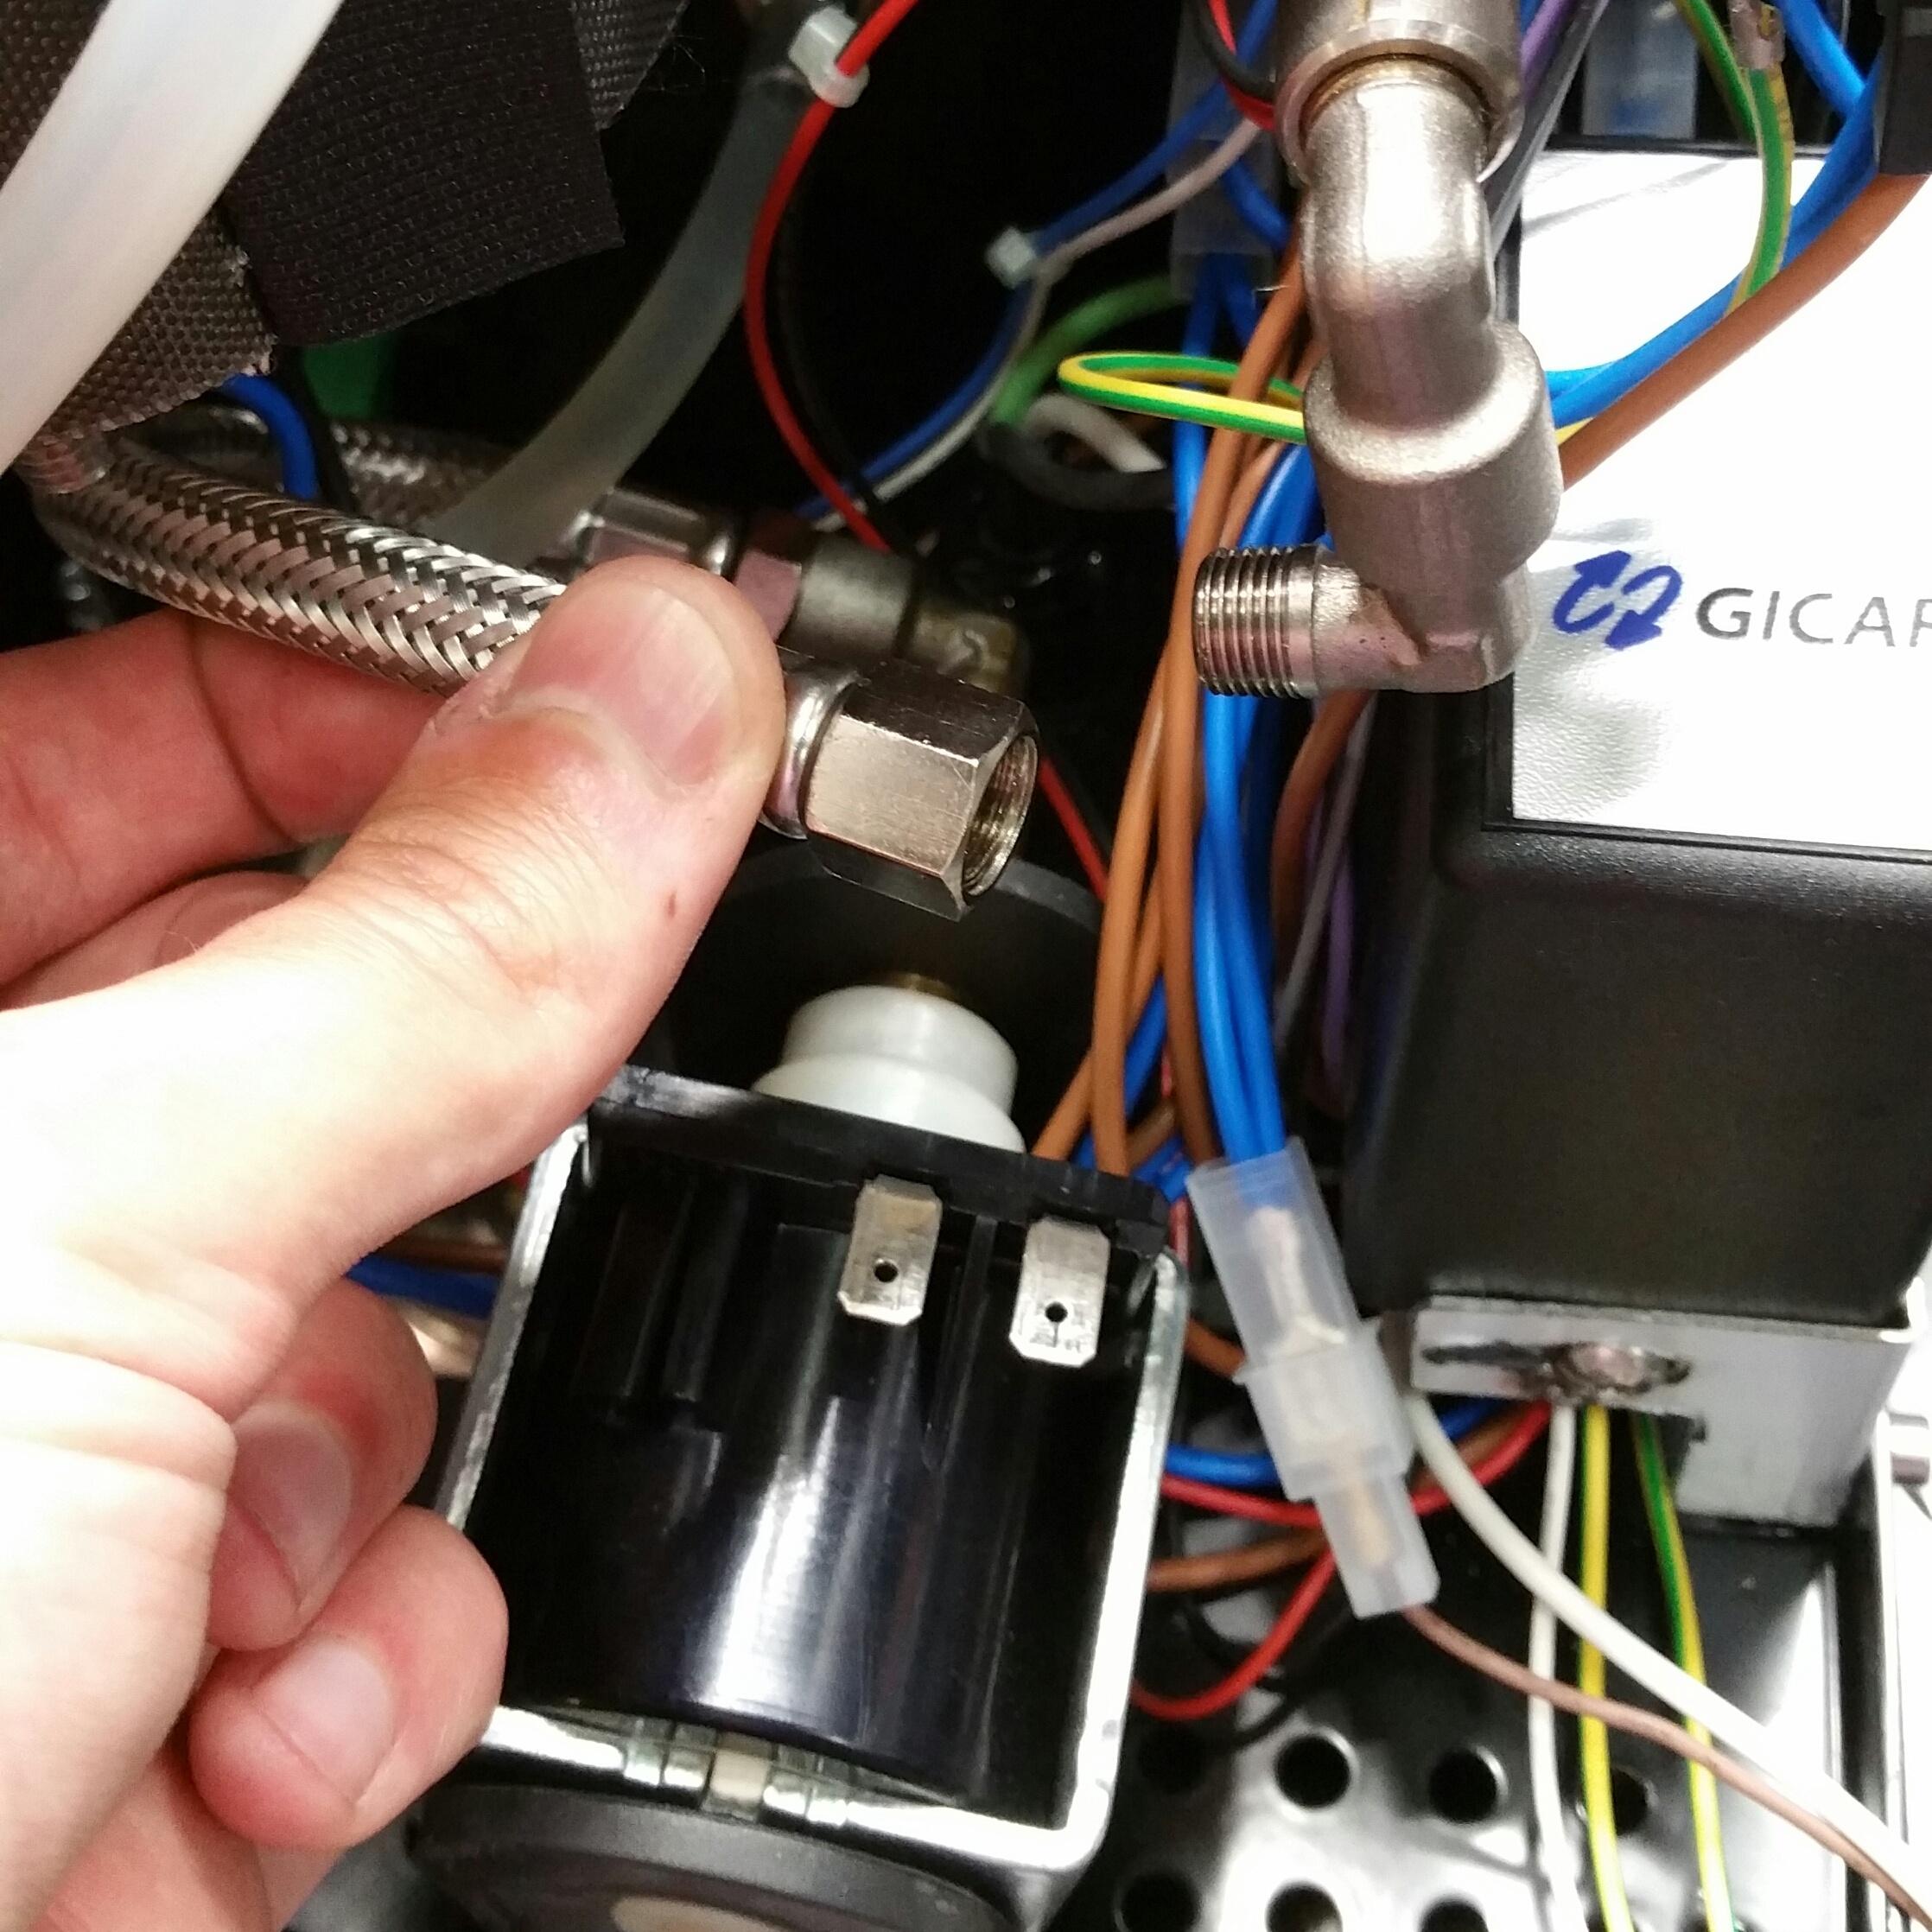 Profitec Pro 300: Removing/Replacing Vibratory Pump